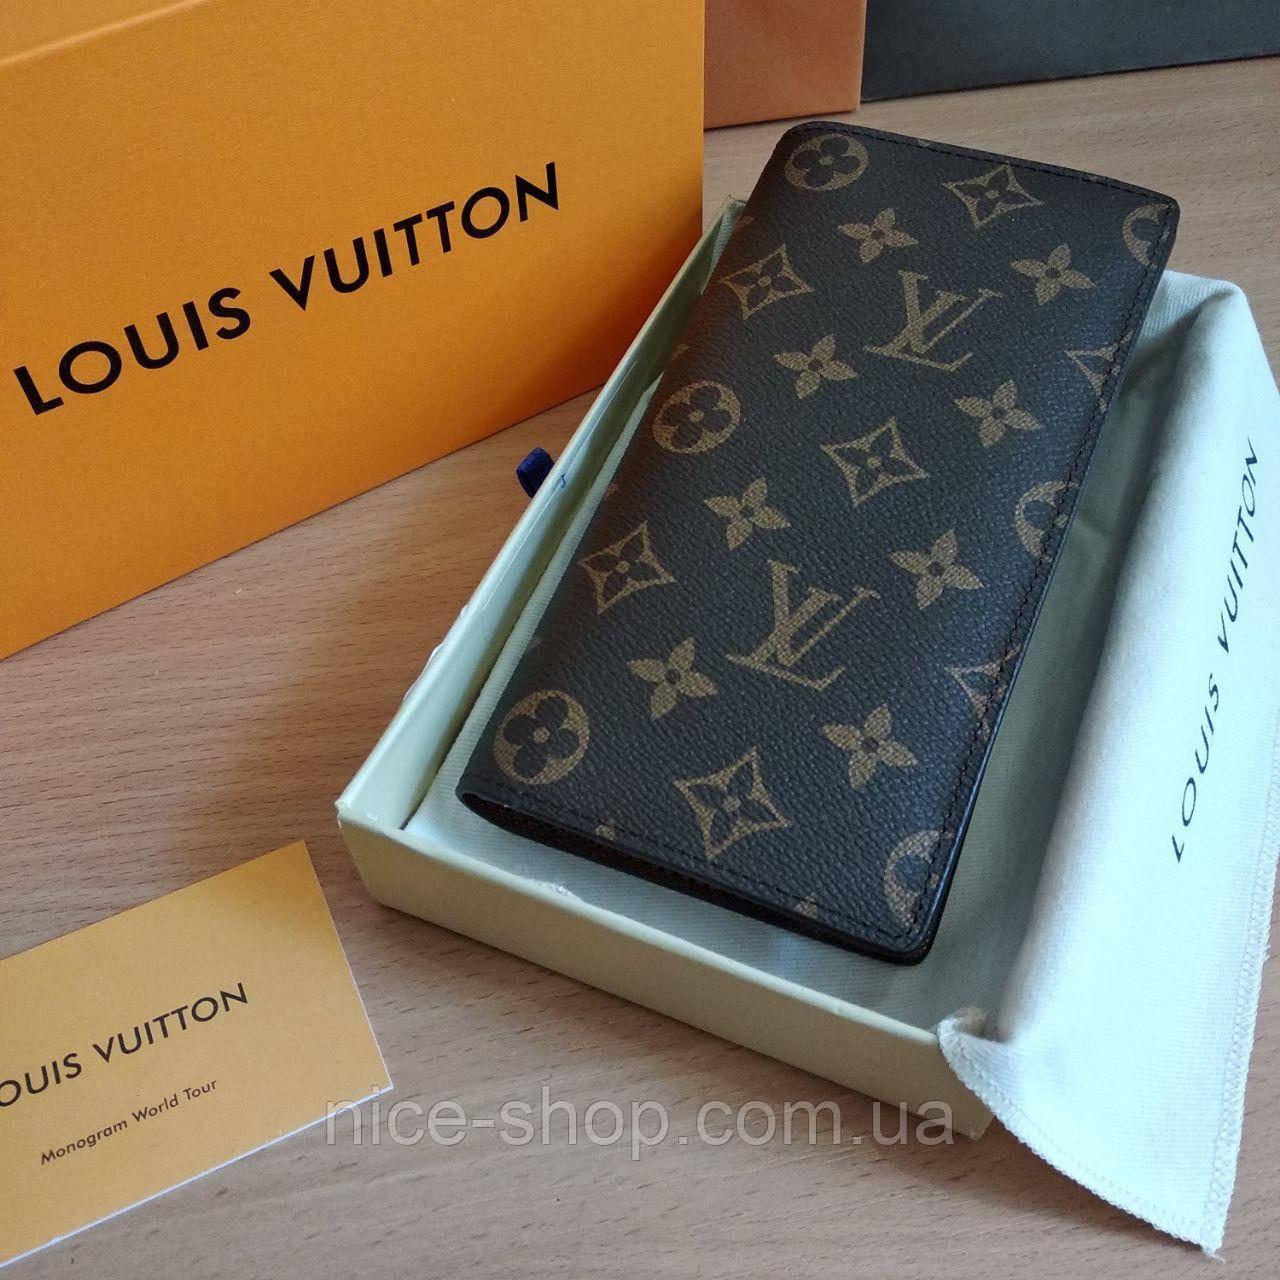 Кошелек-книжка Louis Vuitton кожаный